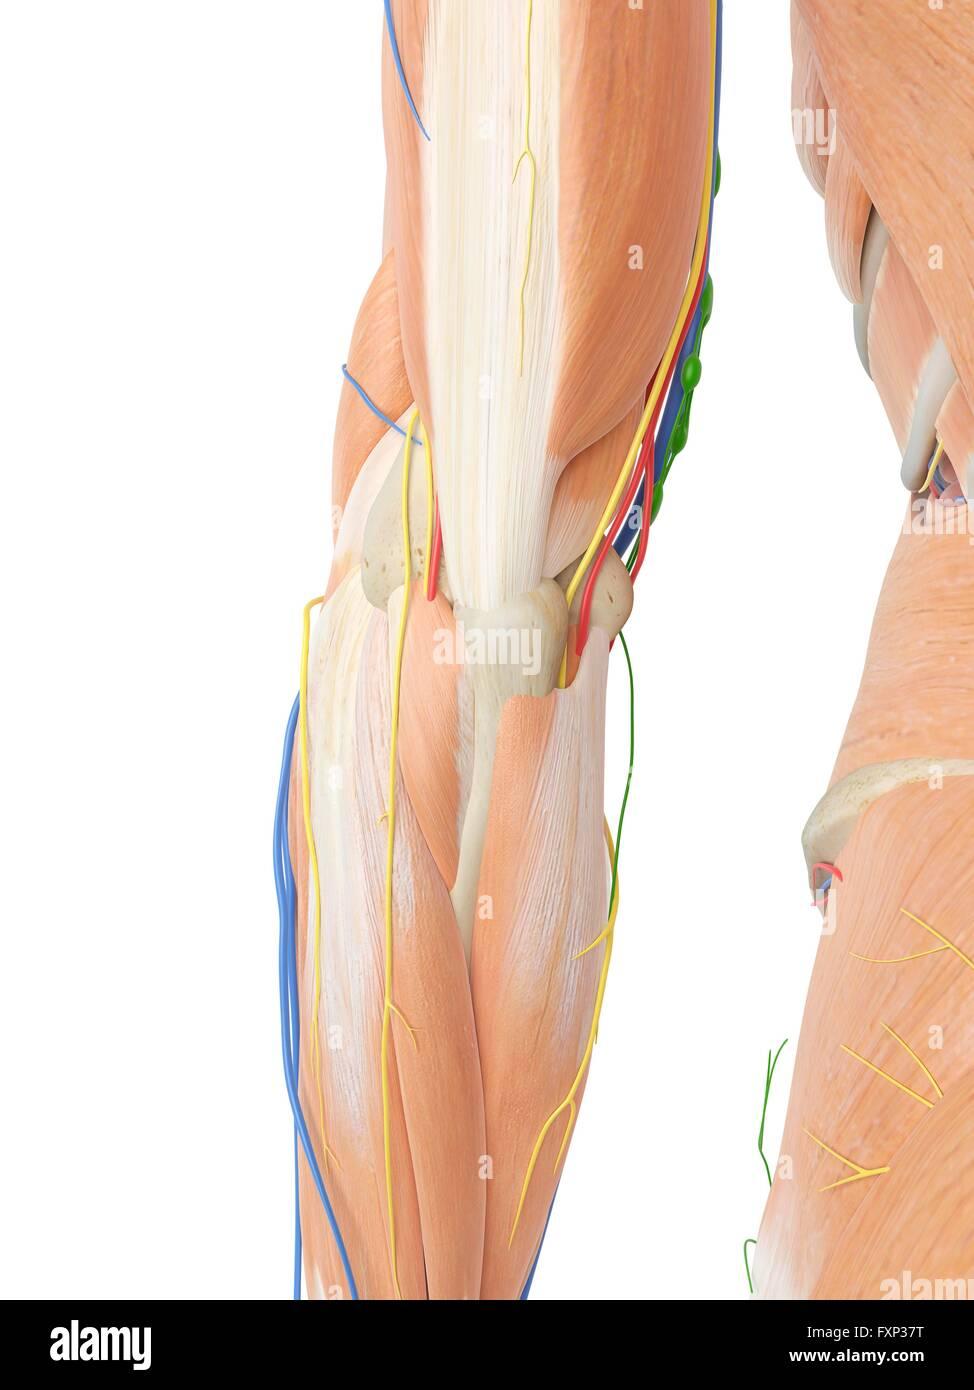 Arm Arteries Stock Photos & Arm Arteries Stock Images - Alamy